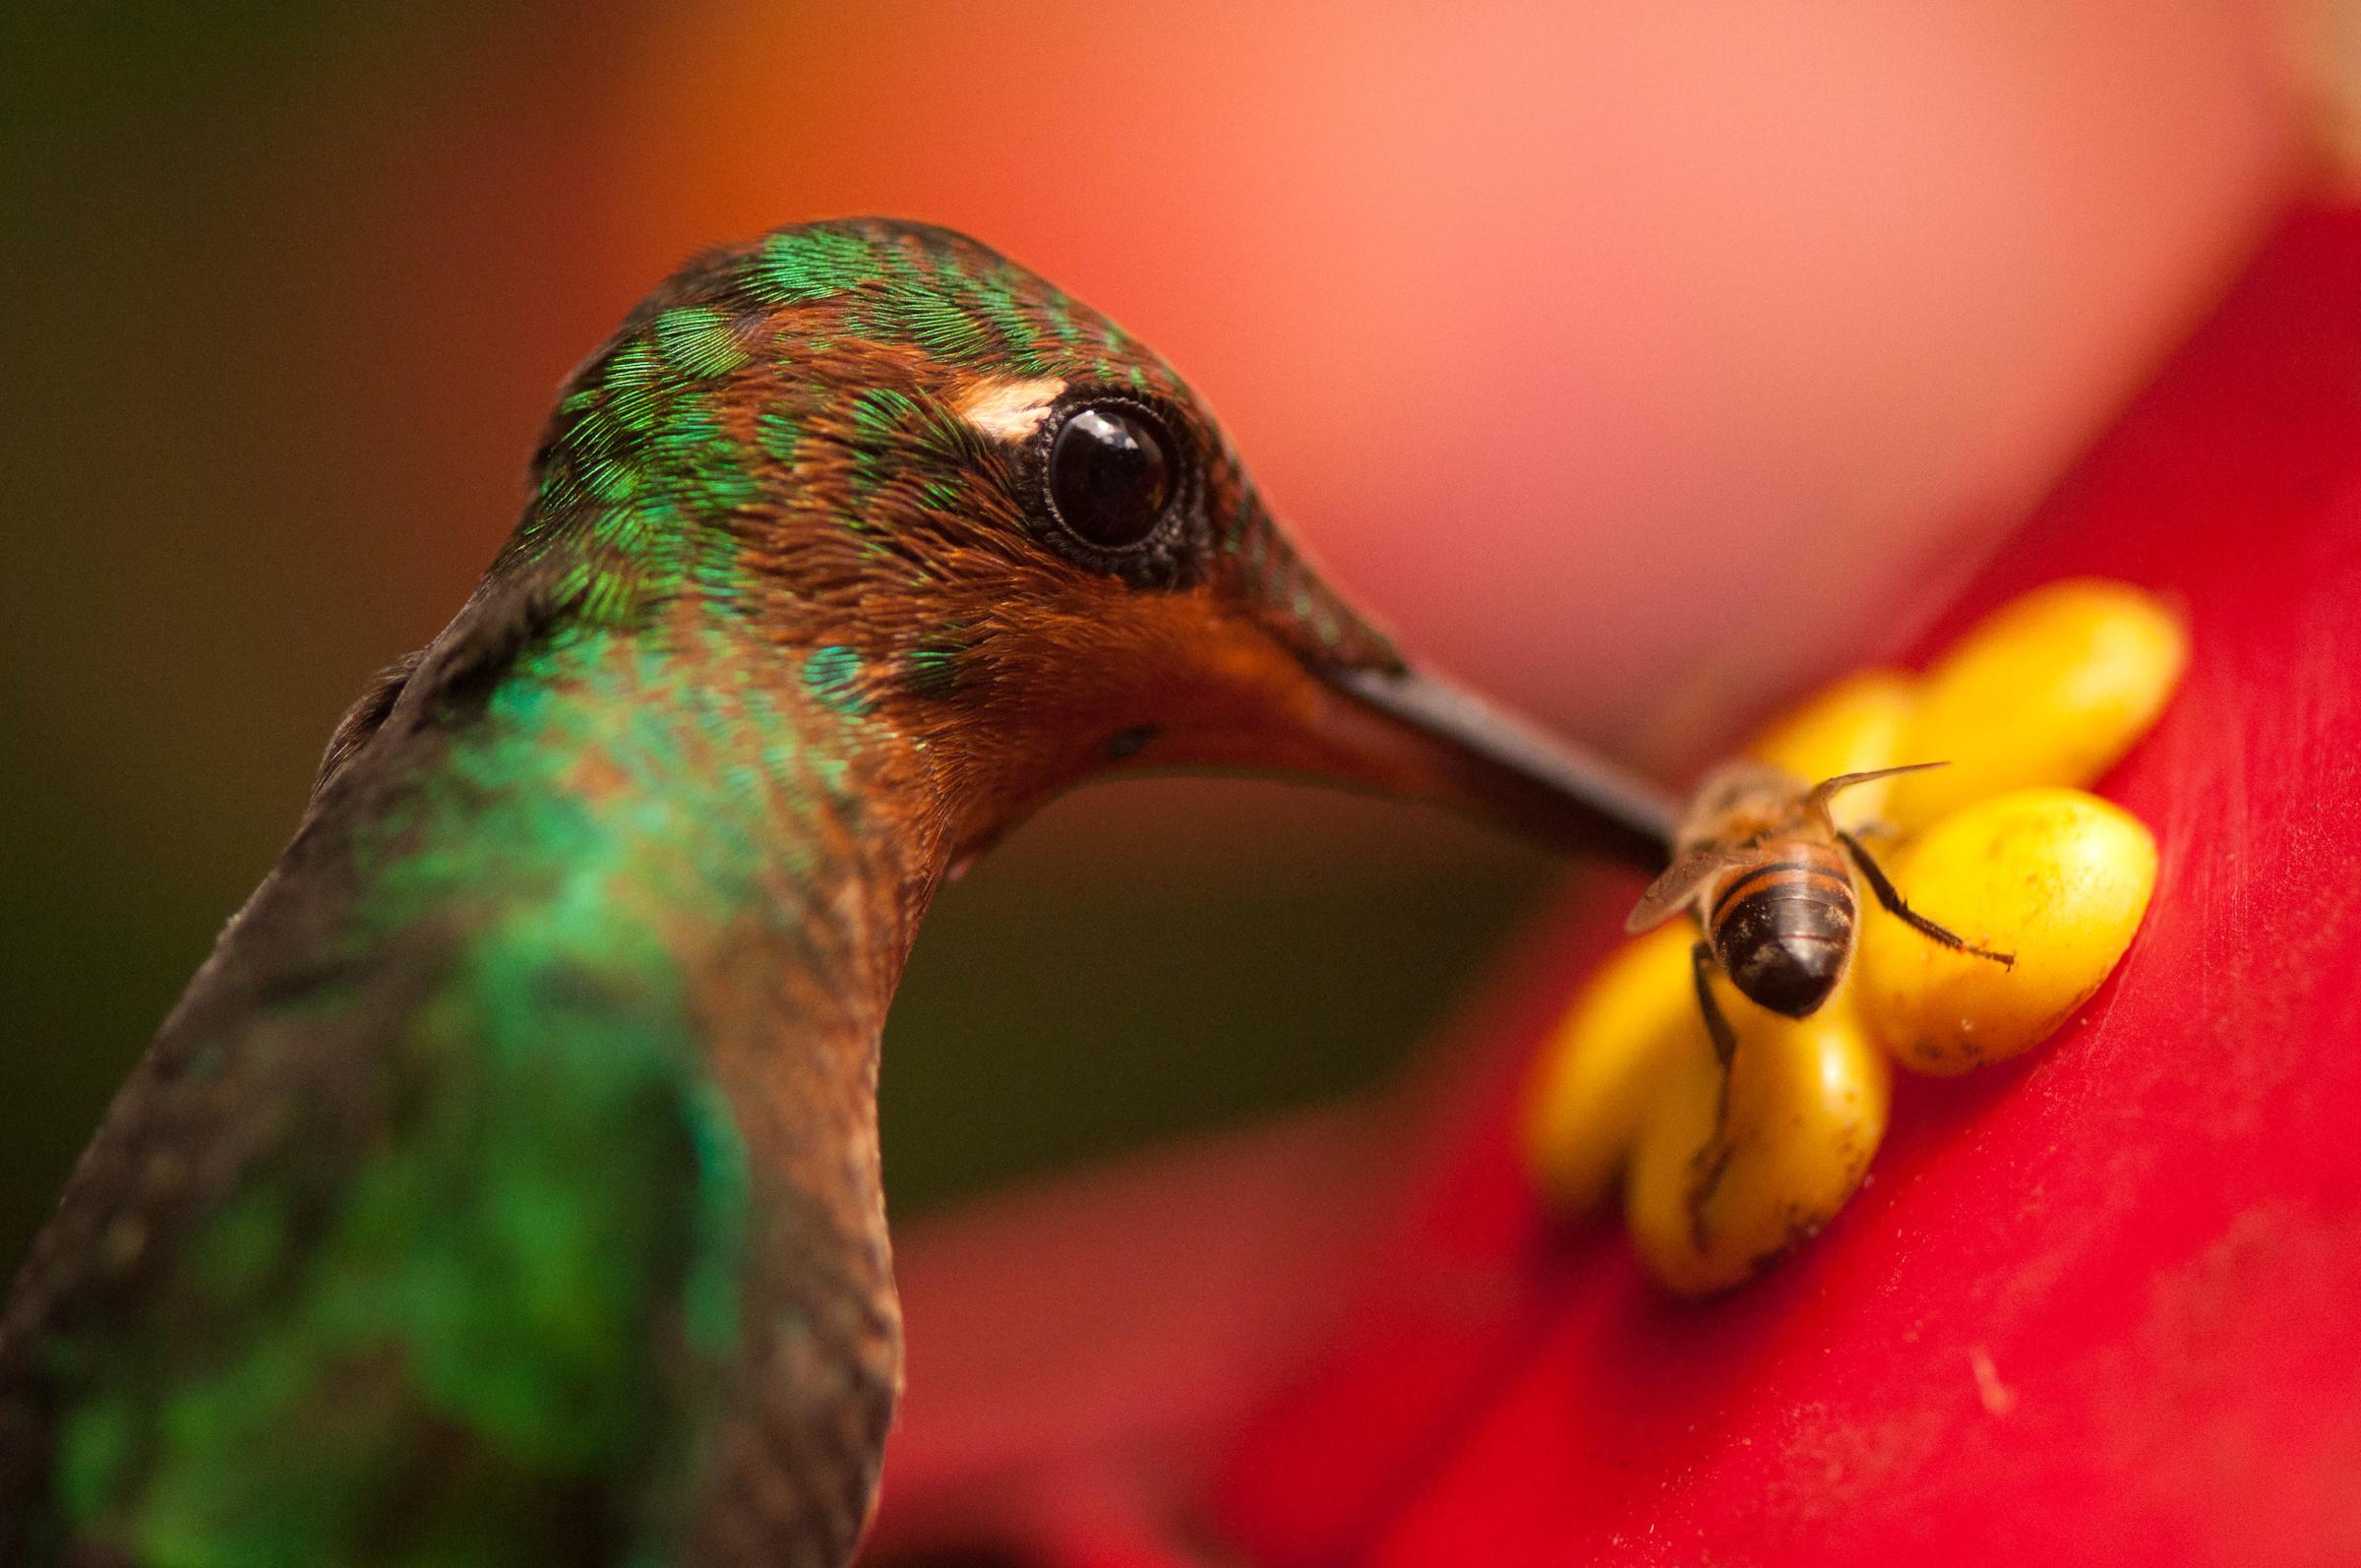 Wildlife_LinaCollado_Sharing.jpg